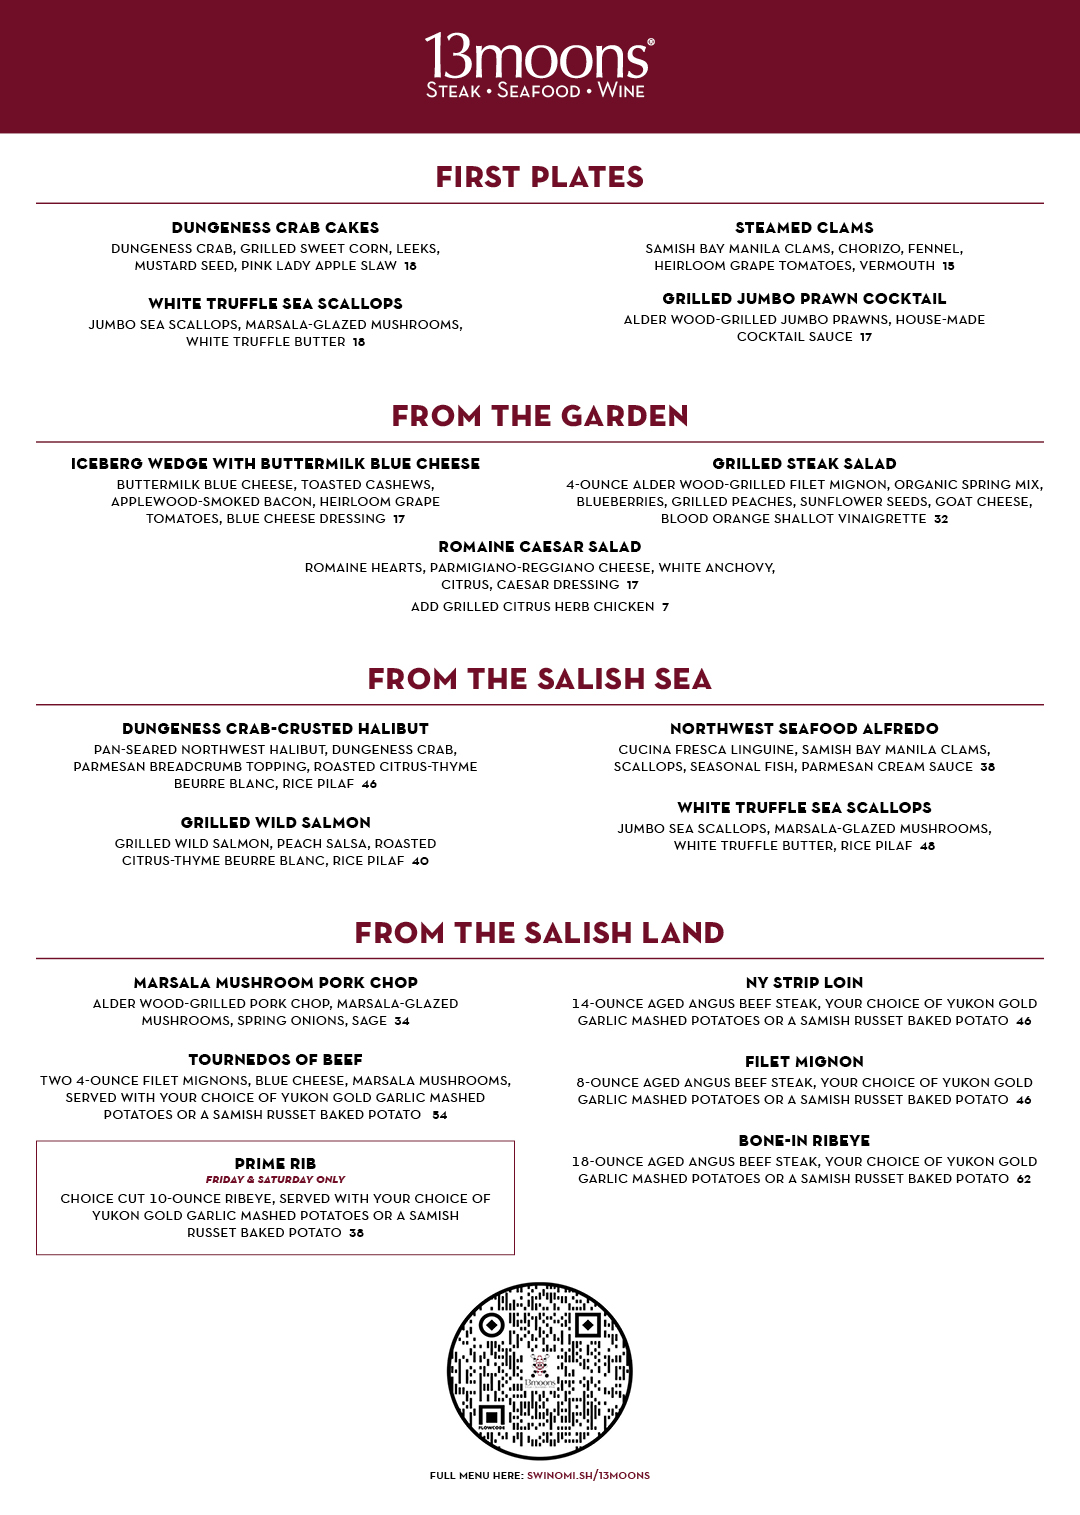 13moons-dinner-menu-swinomish-casino-steak-seafood